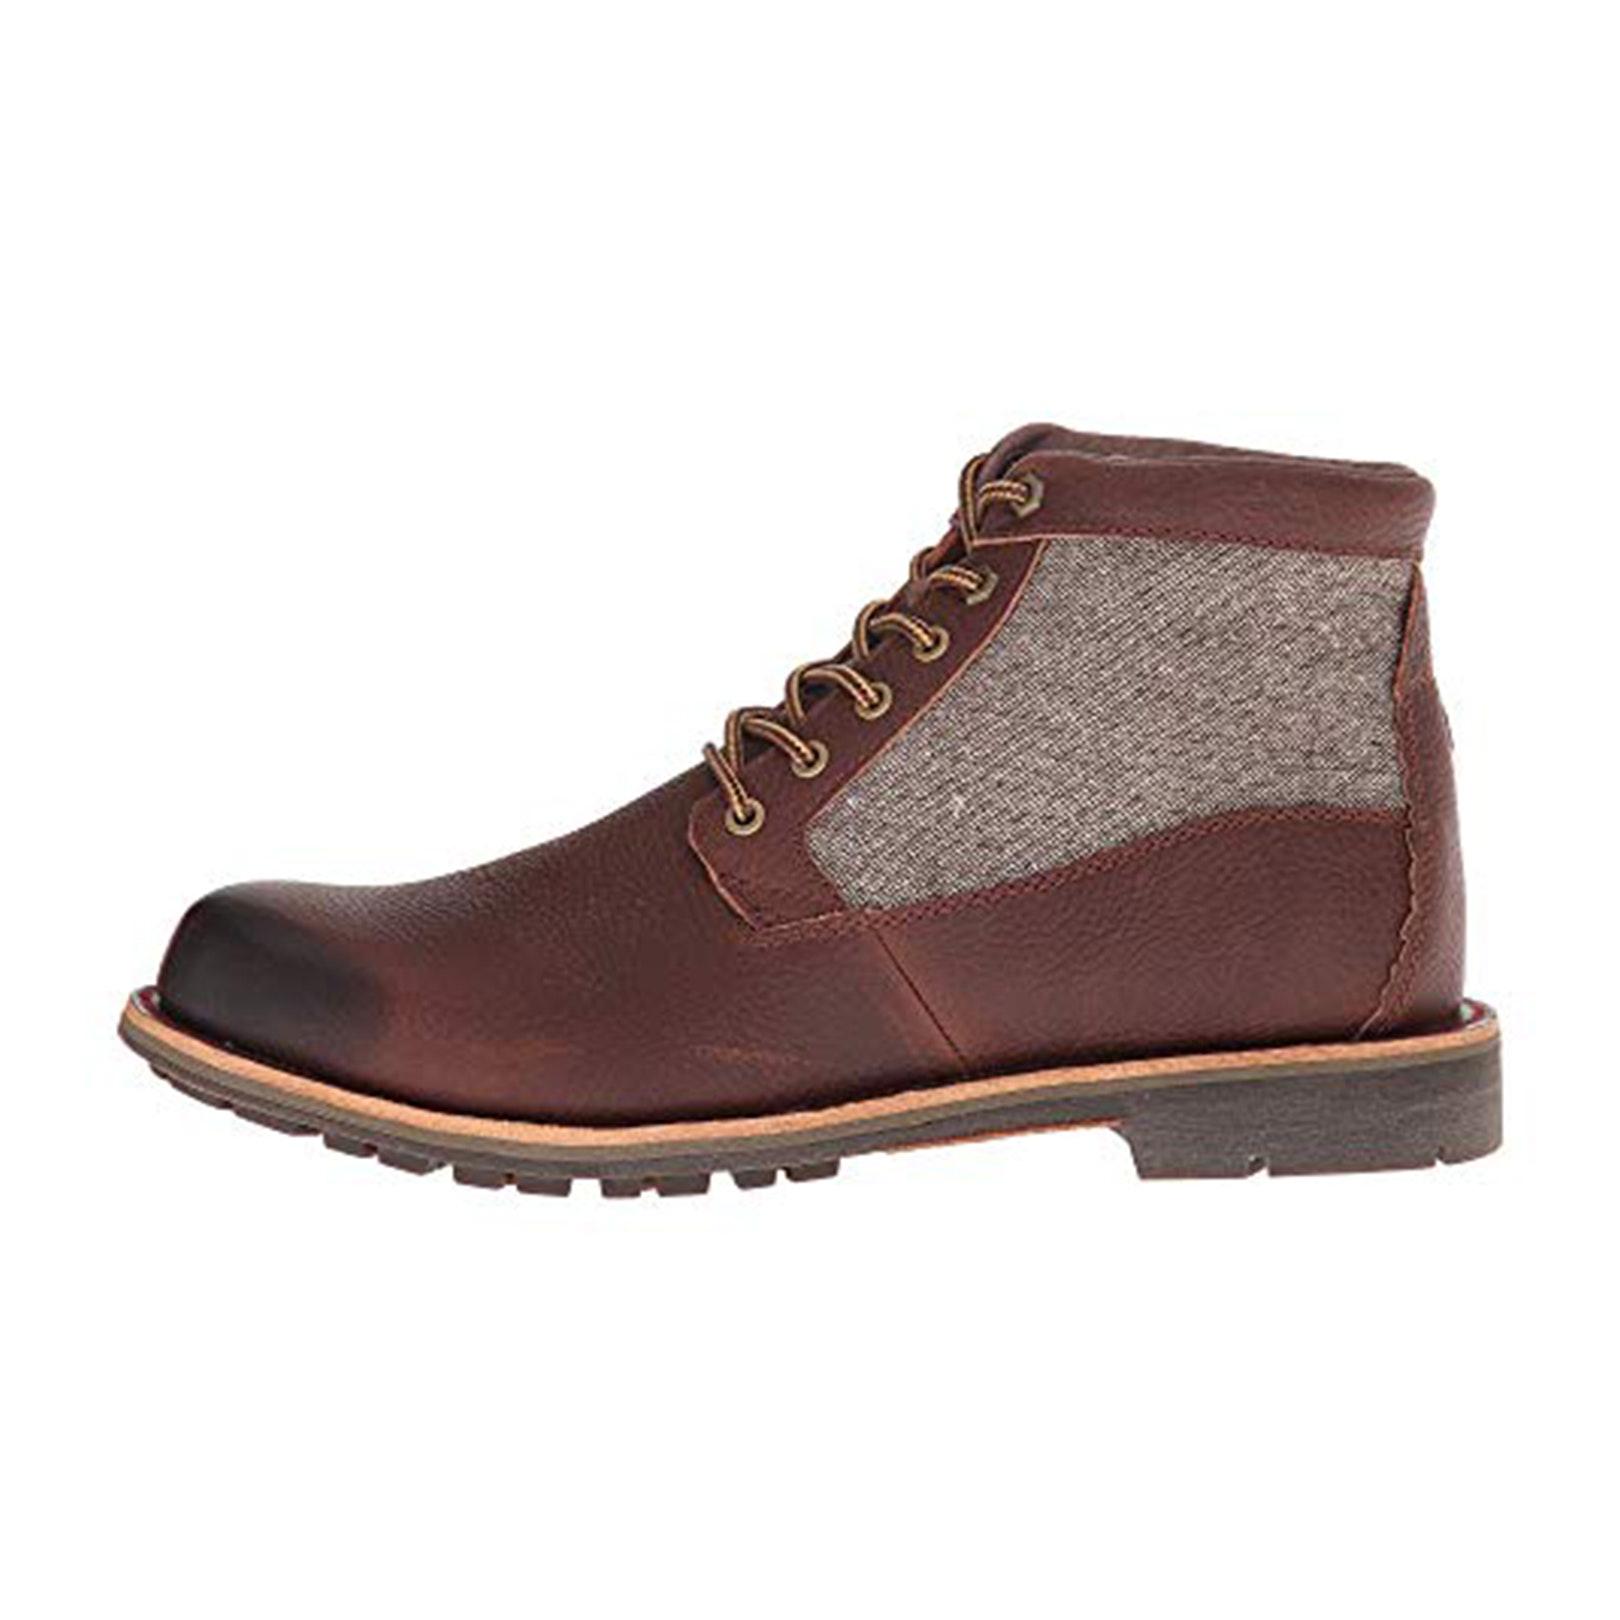 OluKai Hualalai Boot%2C %24190